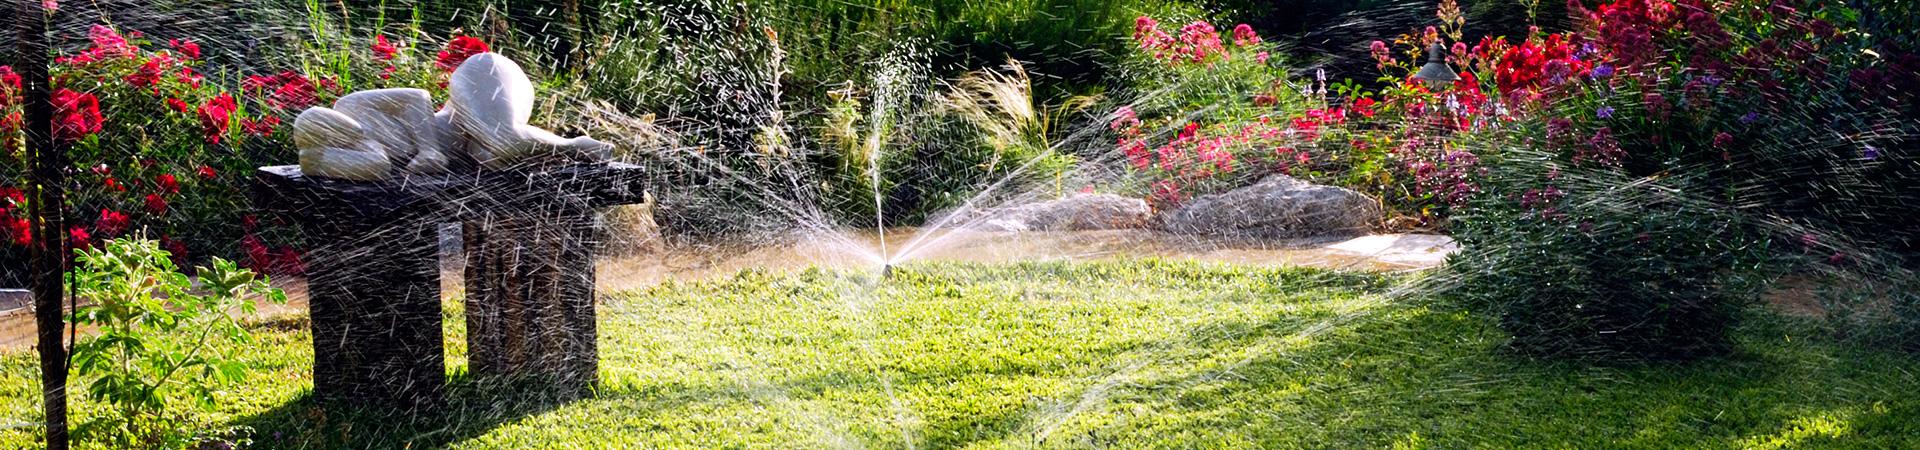 Contactez mille et un jardins versailles for Entretien jardin versailles